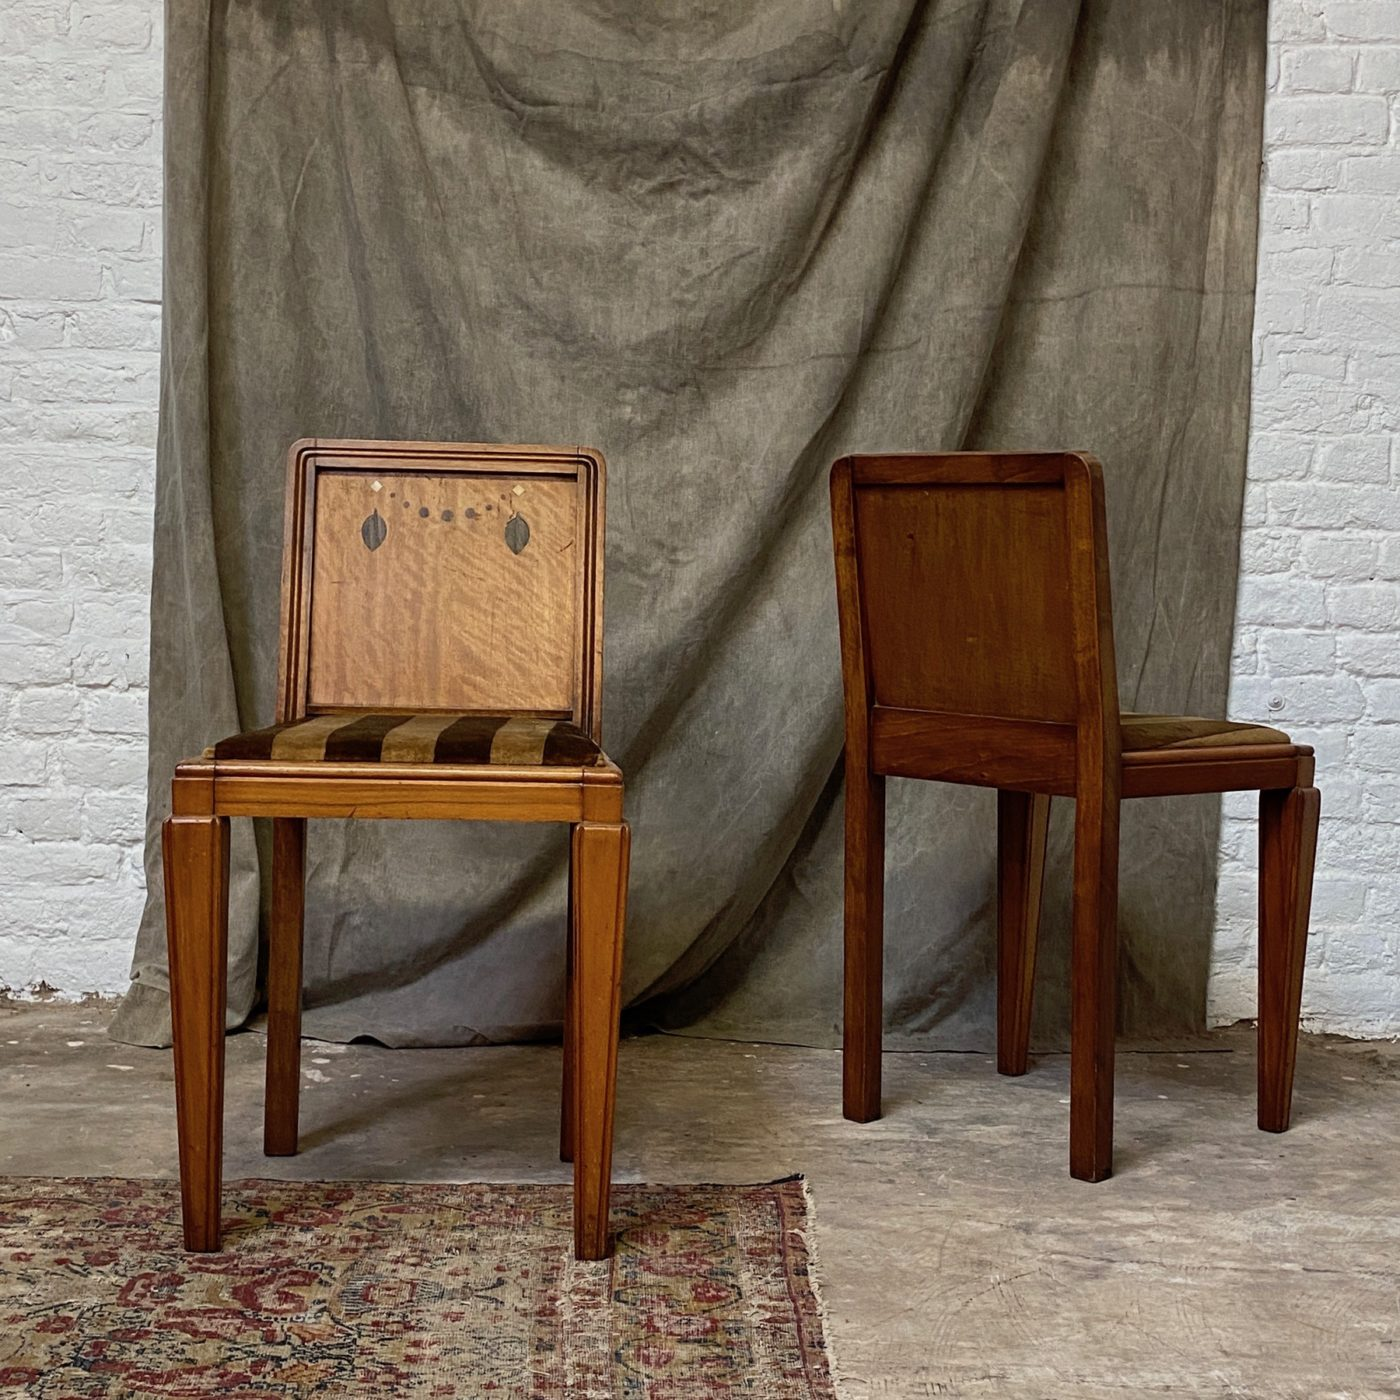 art-deco-chairs0008